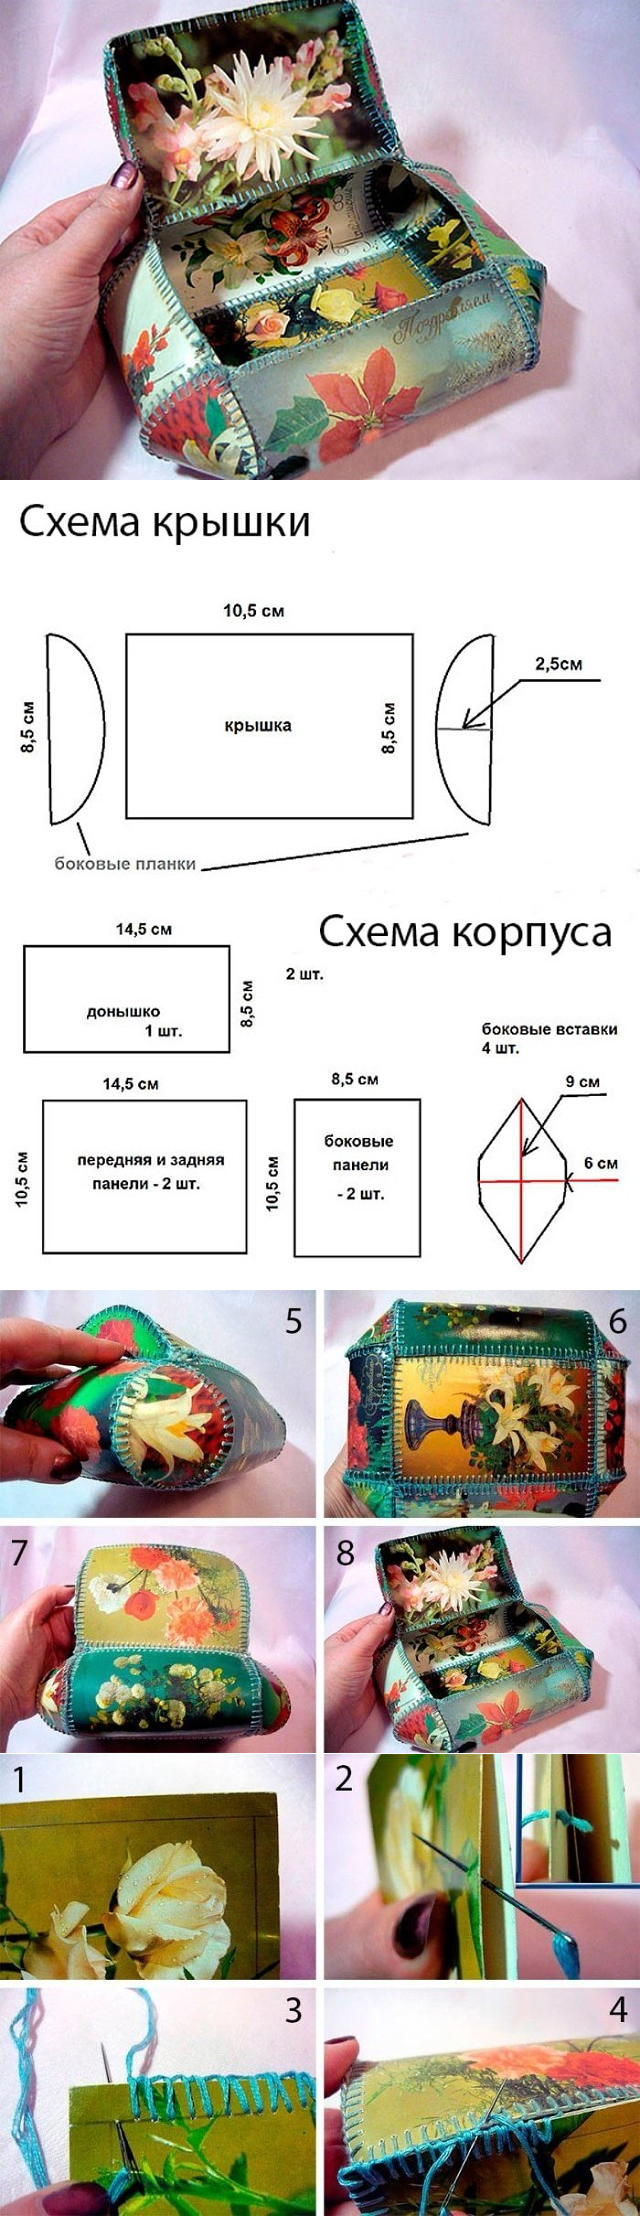 шкатулка из открыток детали виктории